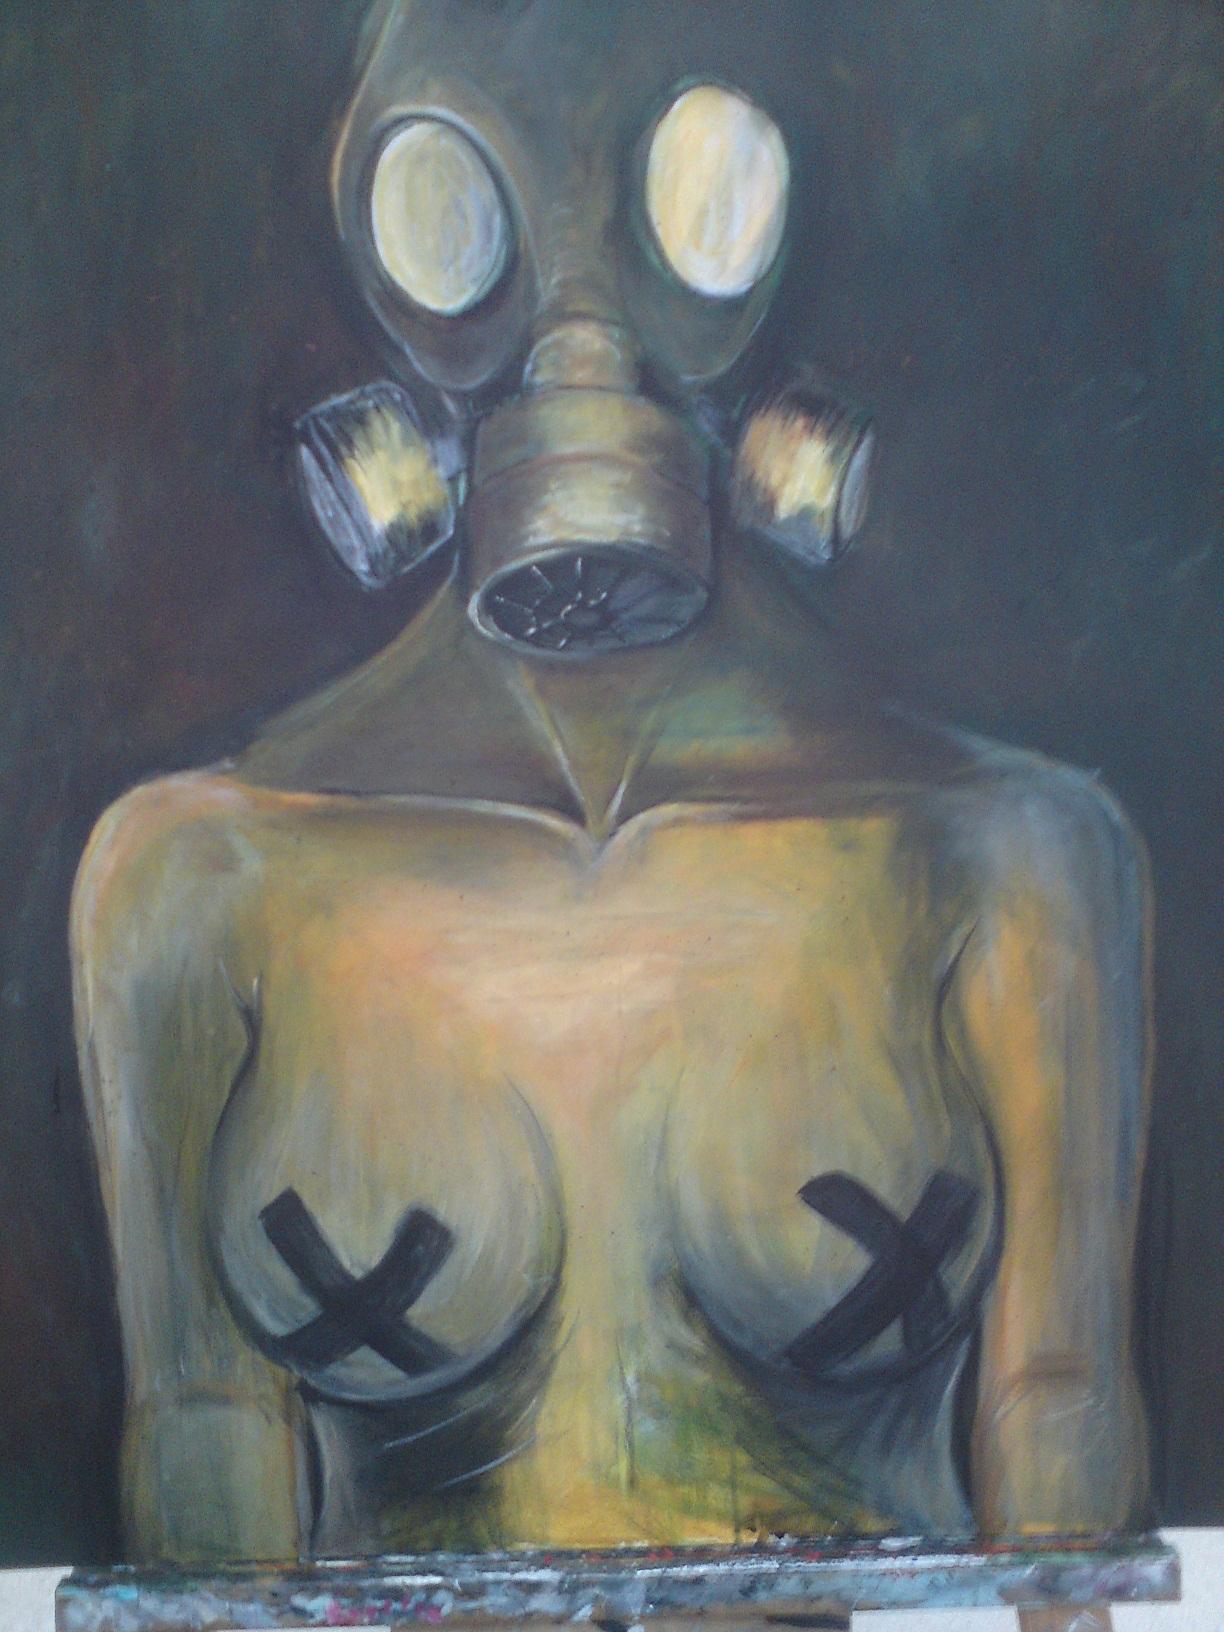 gasmask painting